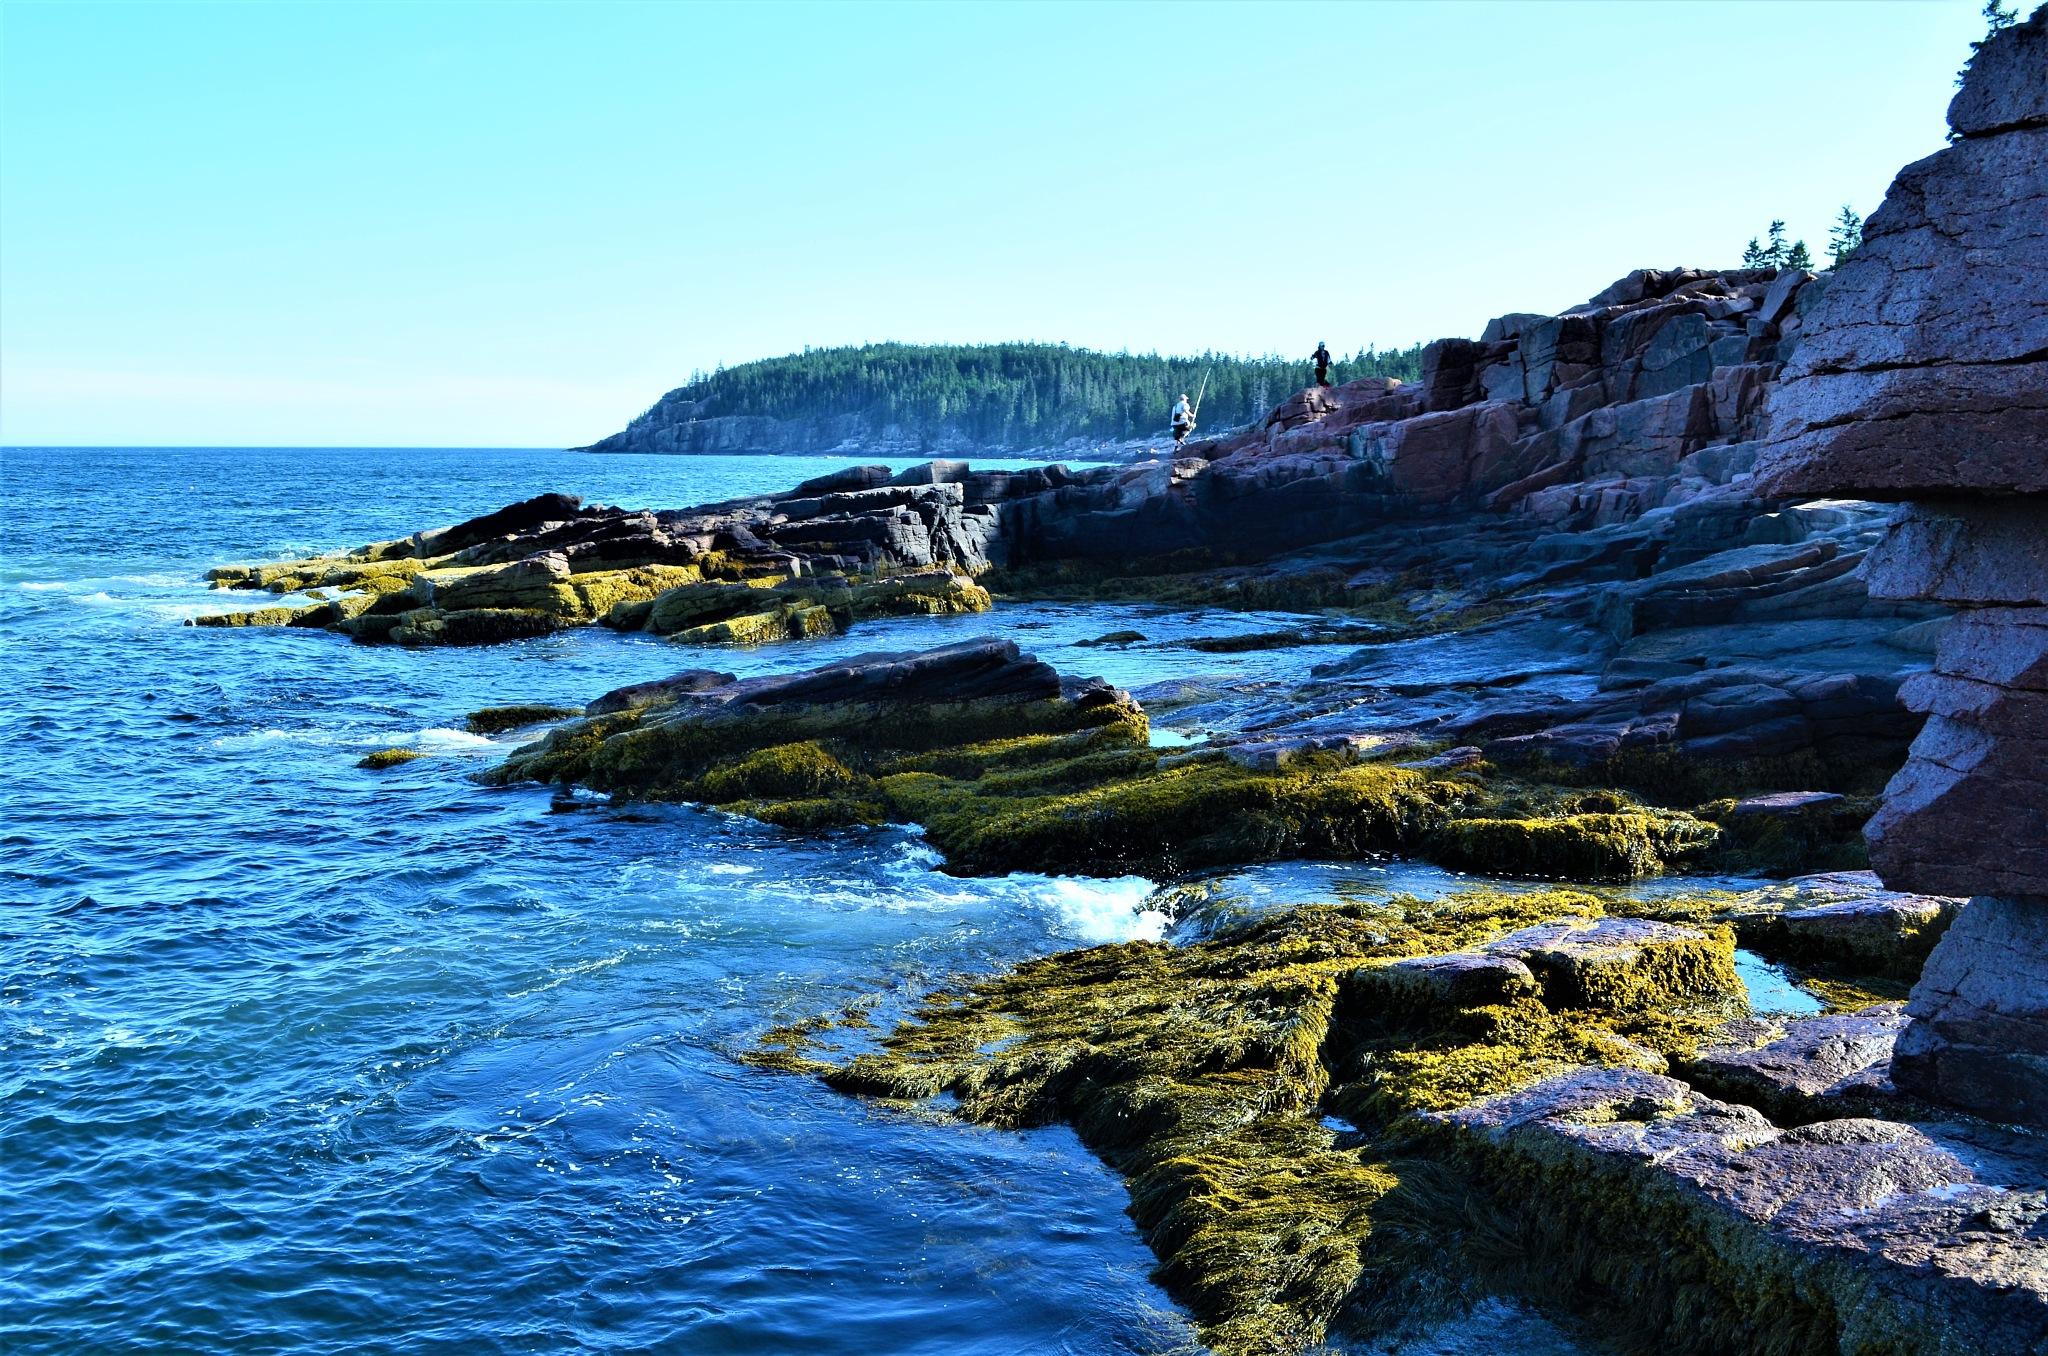 Fishing off the Rocks in Acadia National Park, Maine by Sheri Fresonke Harper